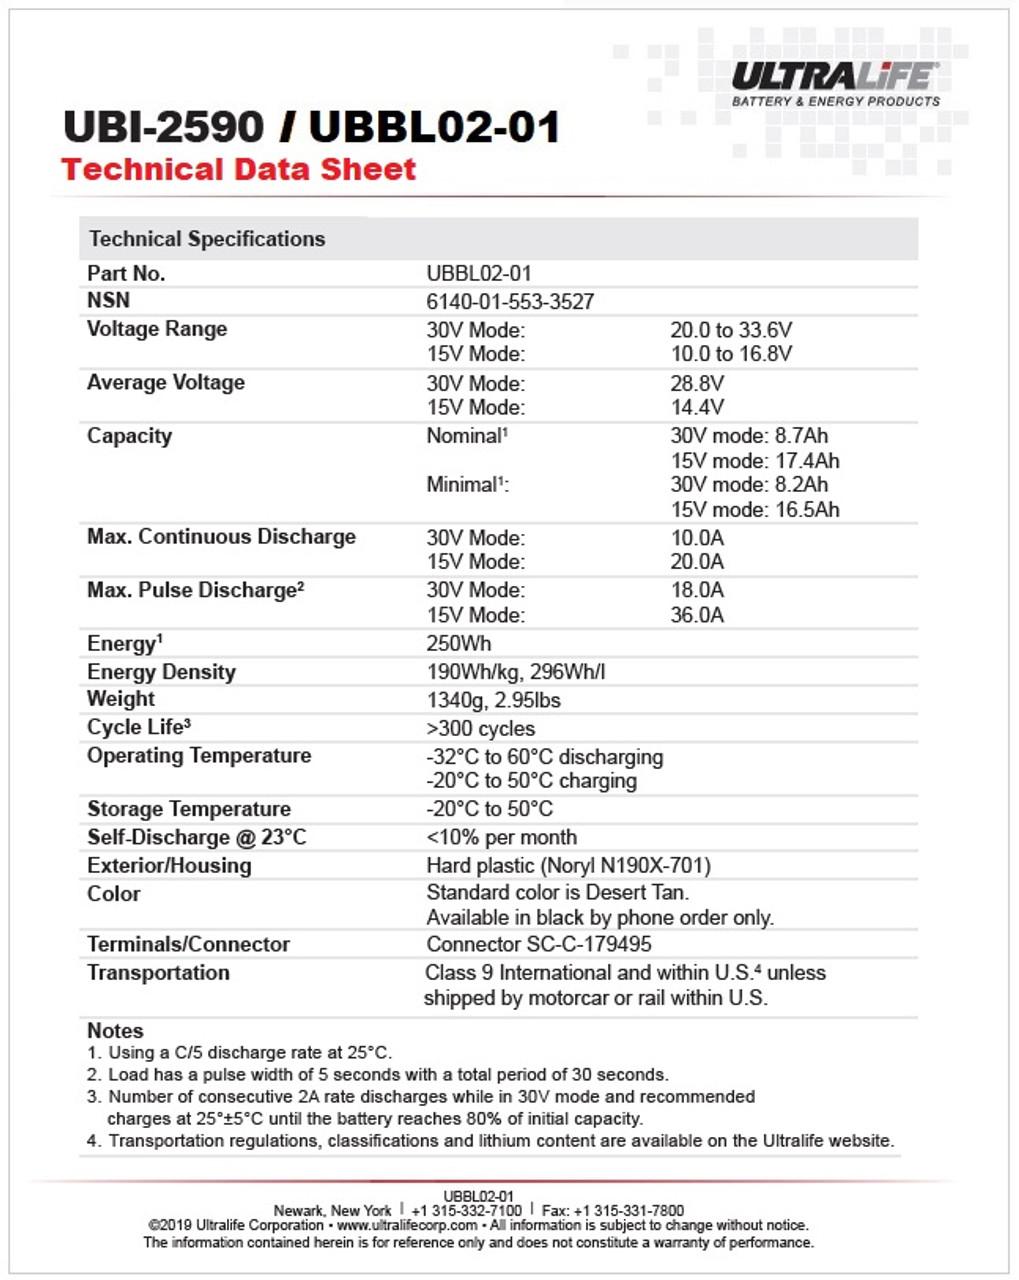 Ultralife UBBL02-01 / UBI-2590 - Technical Data